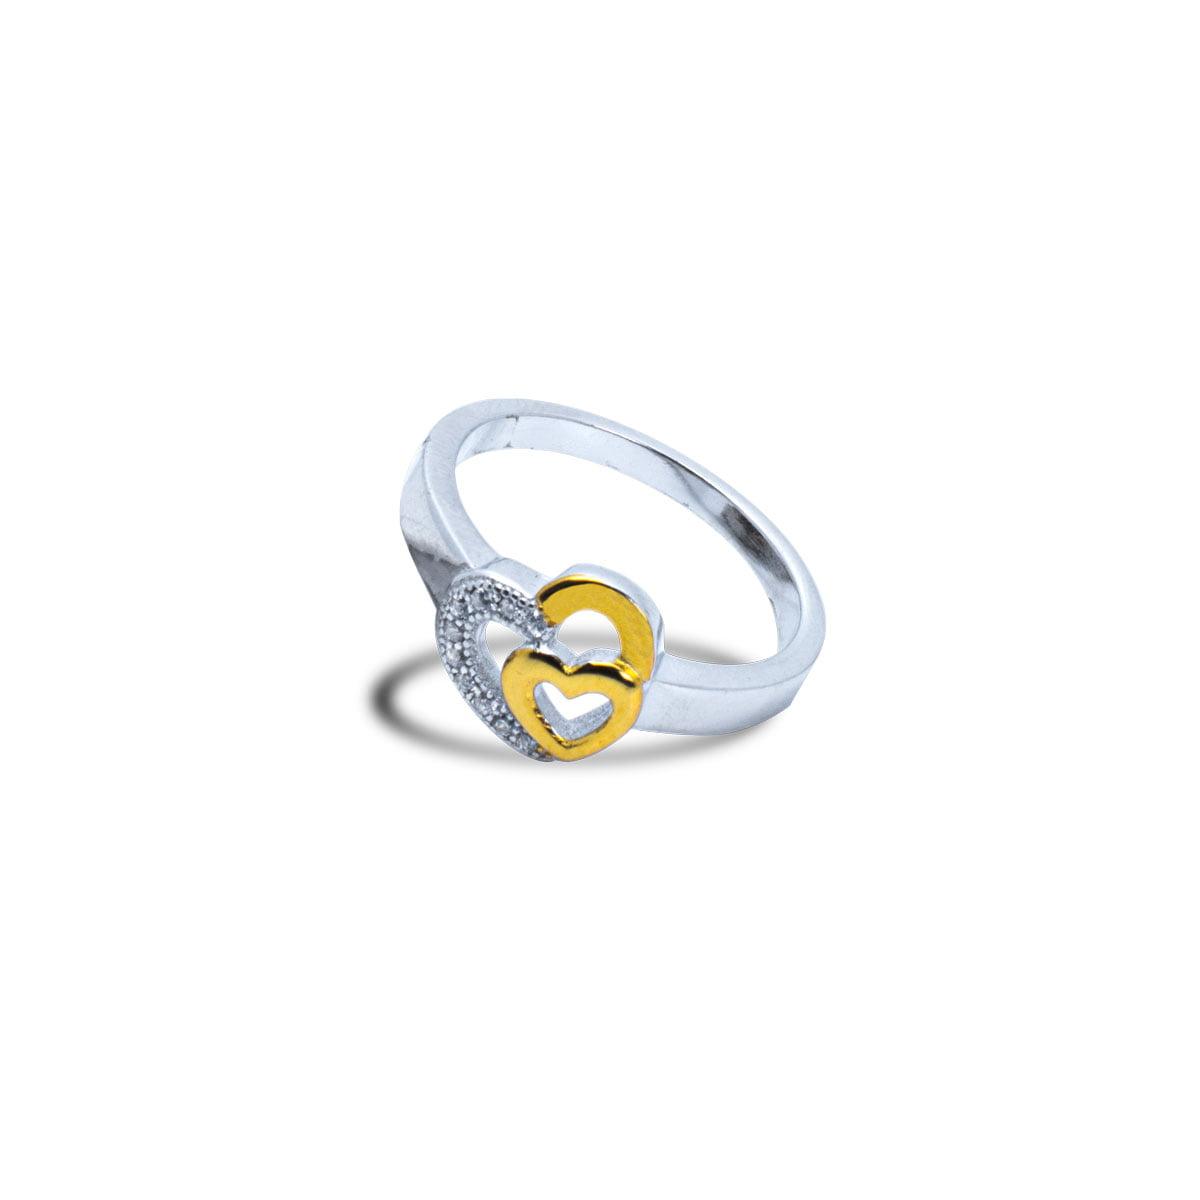 Twin Heart Ring